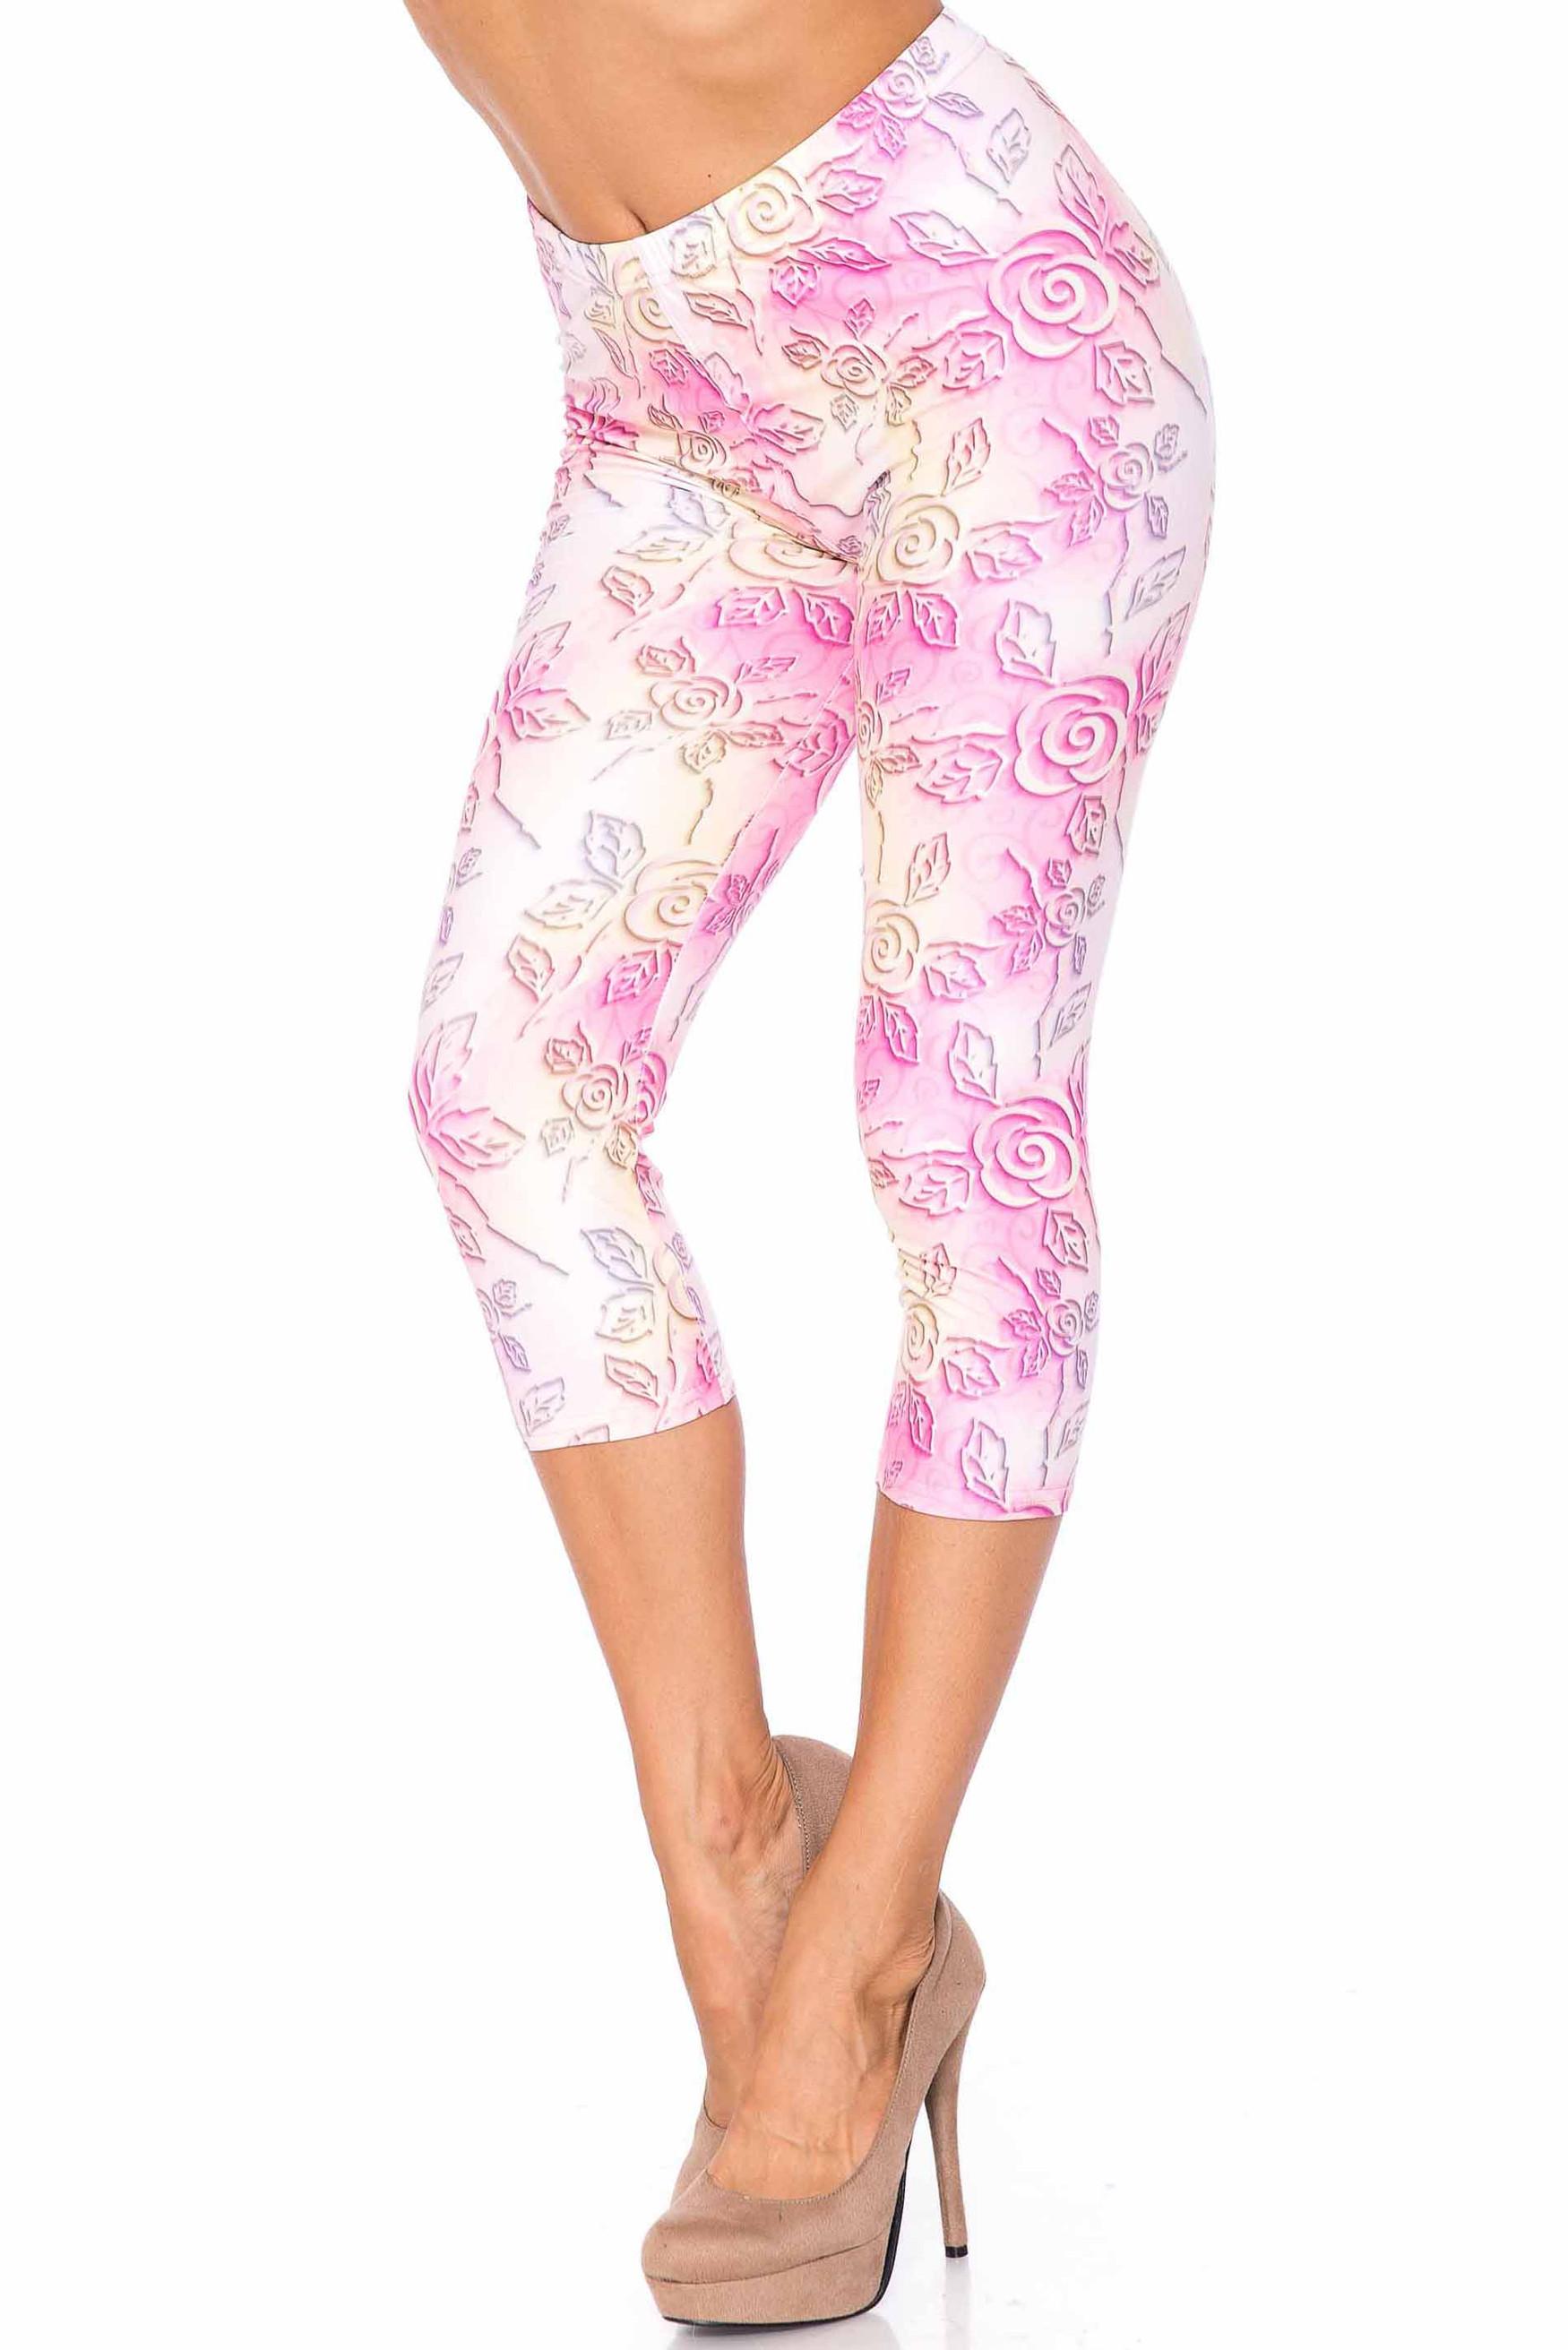 Creamy Soft 3D Pastel Ombre Rose Extra Plus Size Capris - USA Fashion™